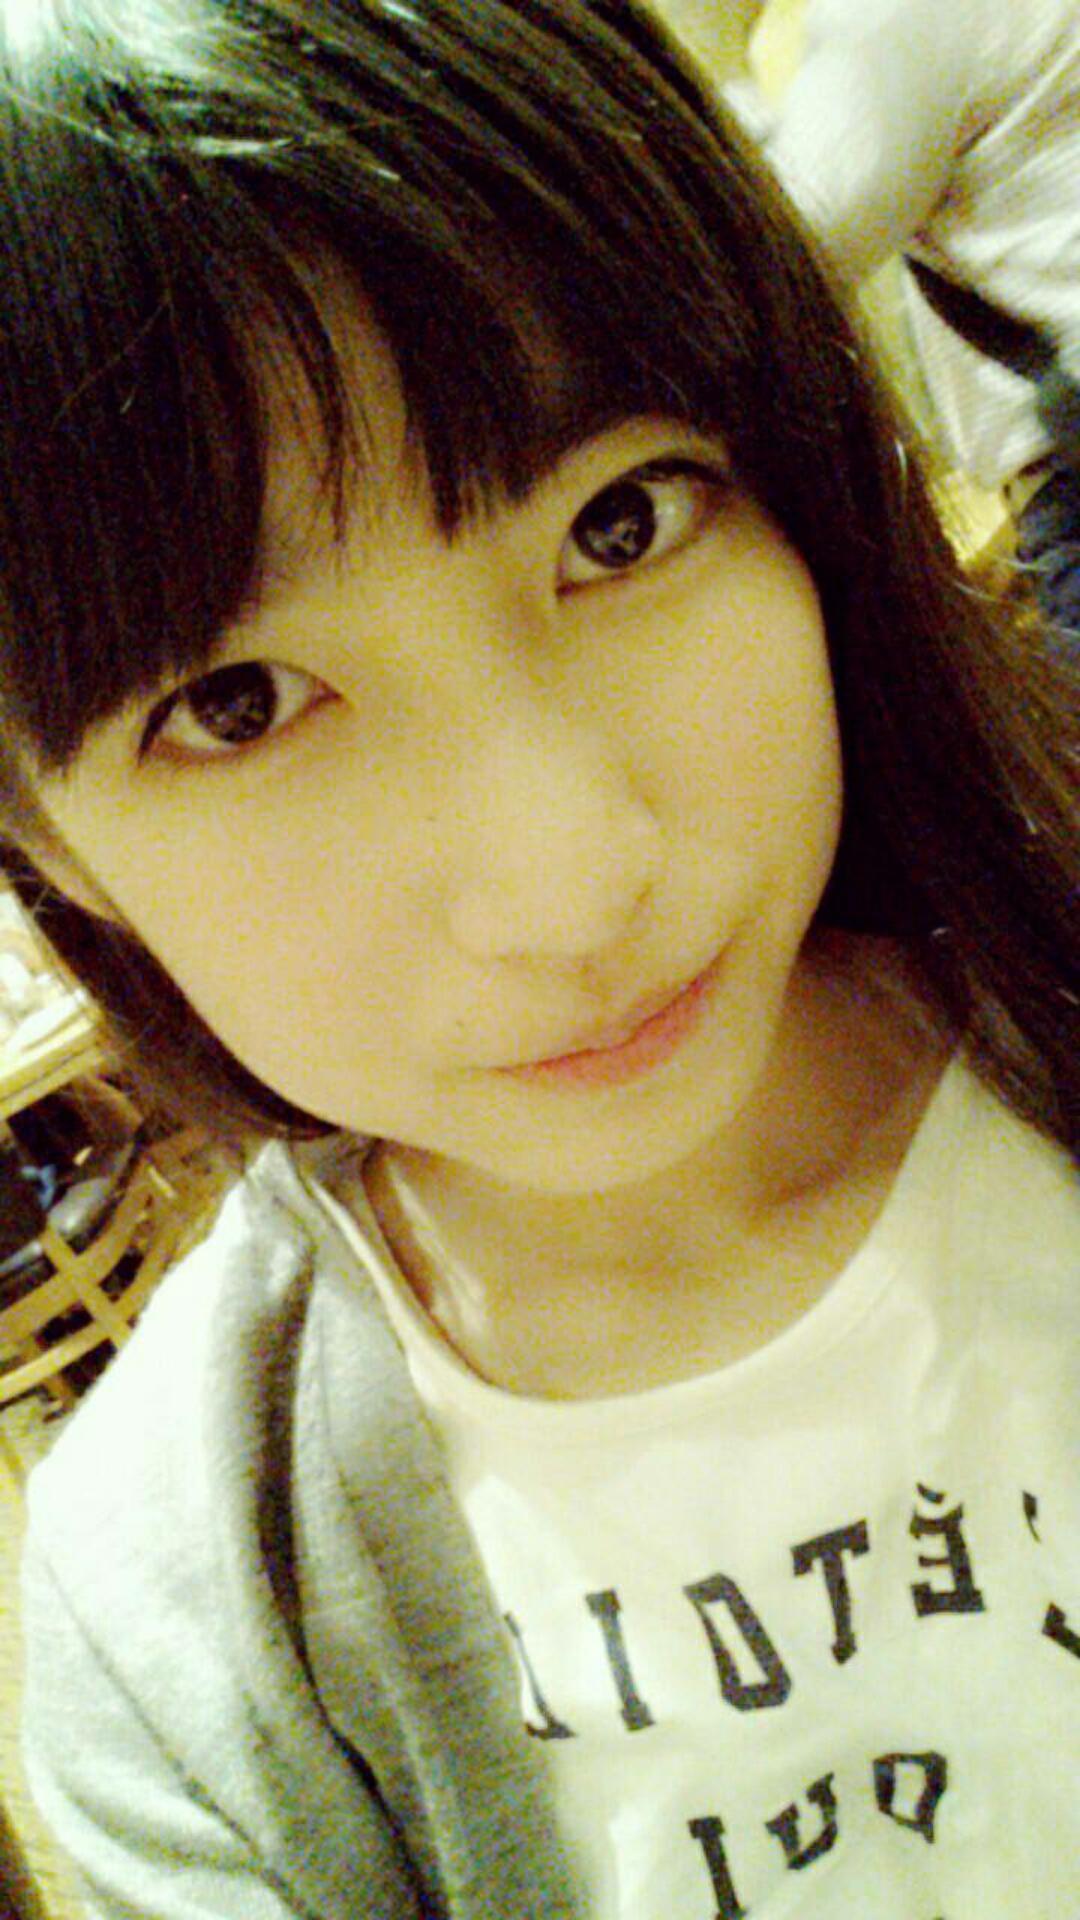 【AKB48チーム8】吉田華恋 応援スレ★2【福岡県】 ©2ch.netYouTube動画>8本 ->画像>503枚